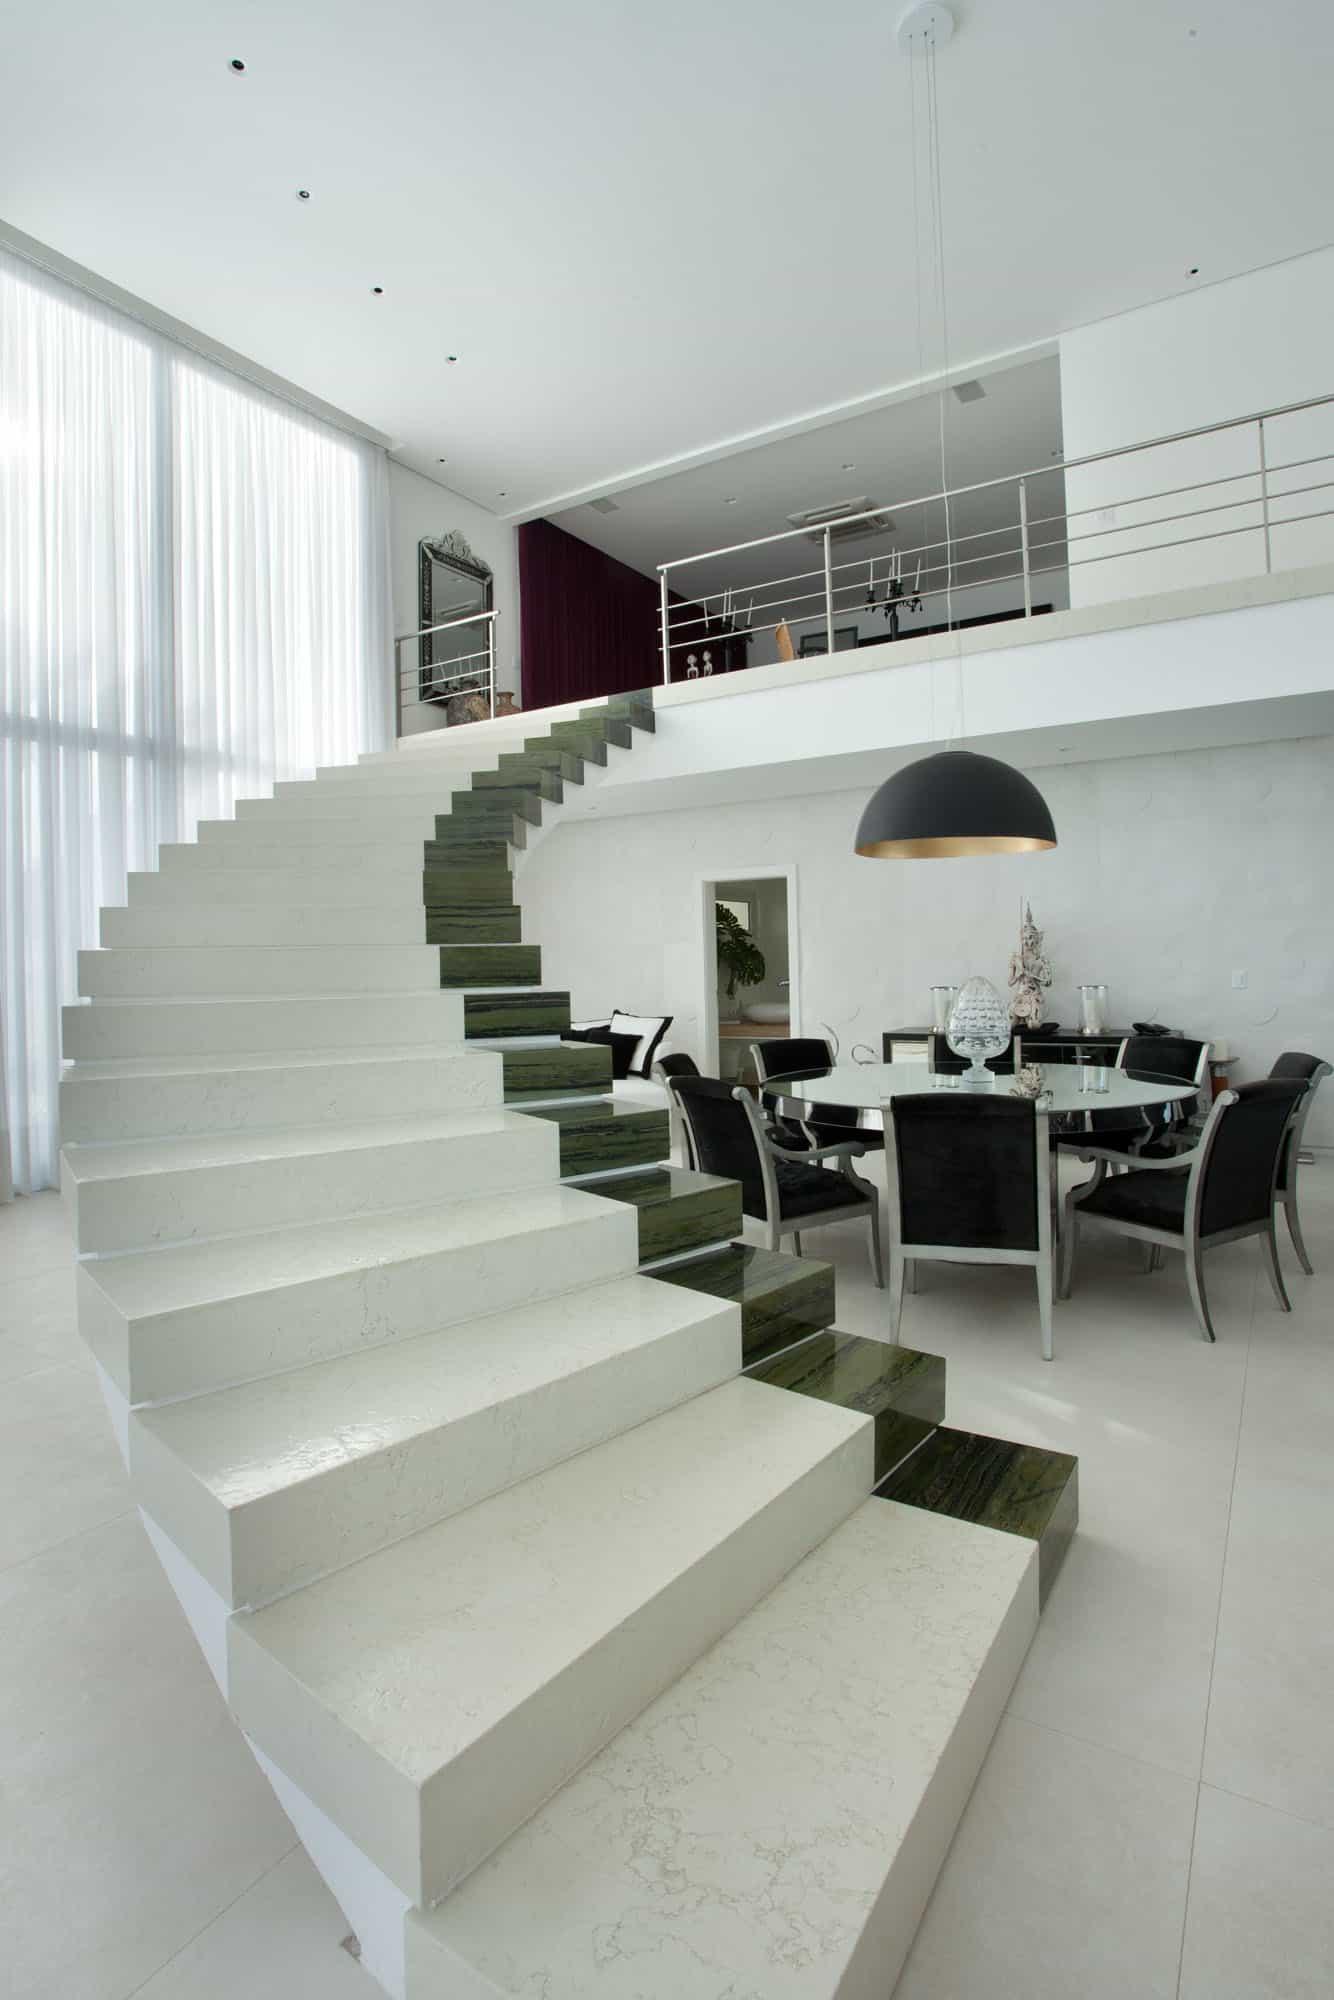 Residencia NJ by Pupogaspar Arquitetura (18)